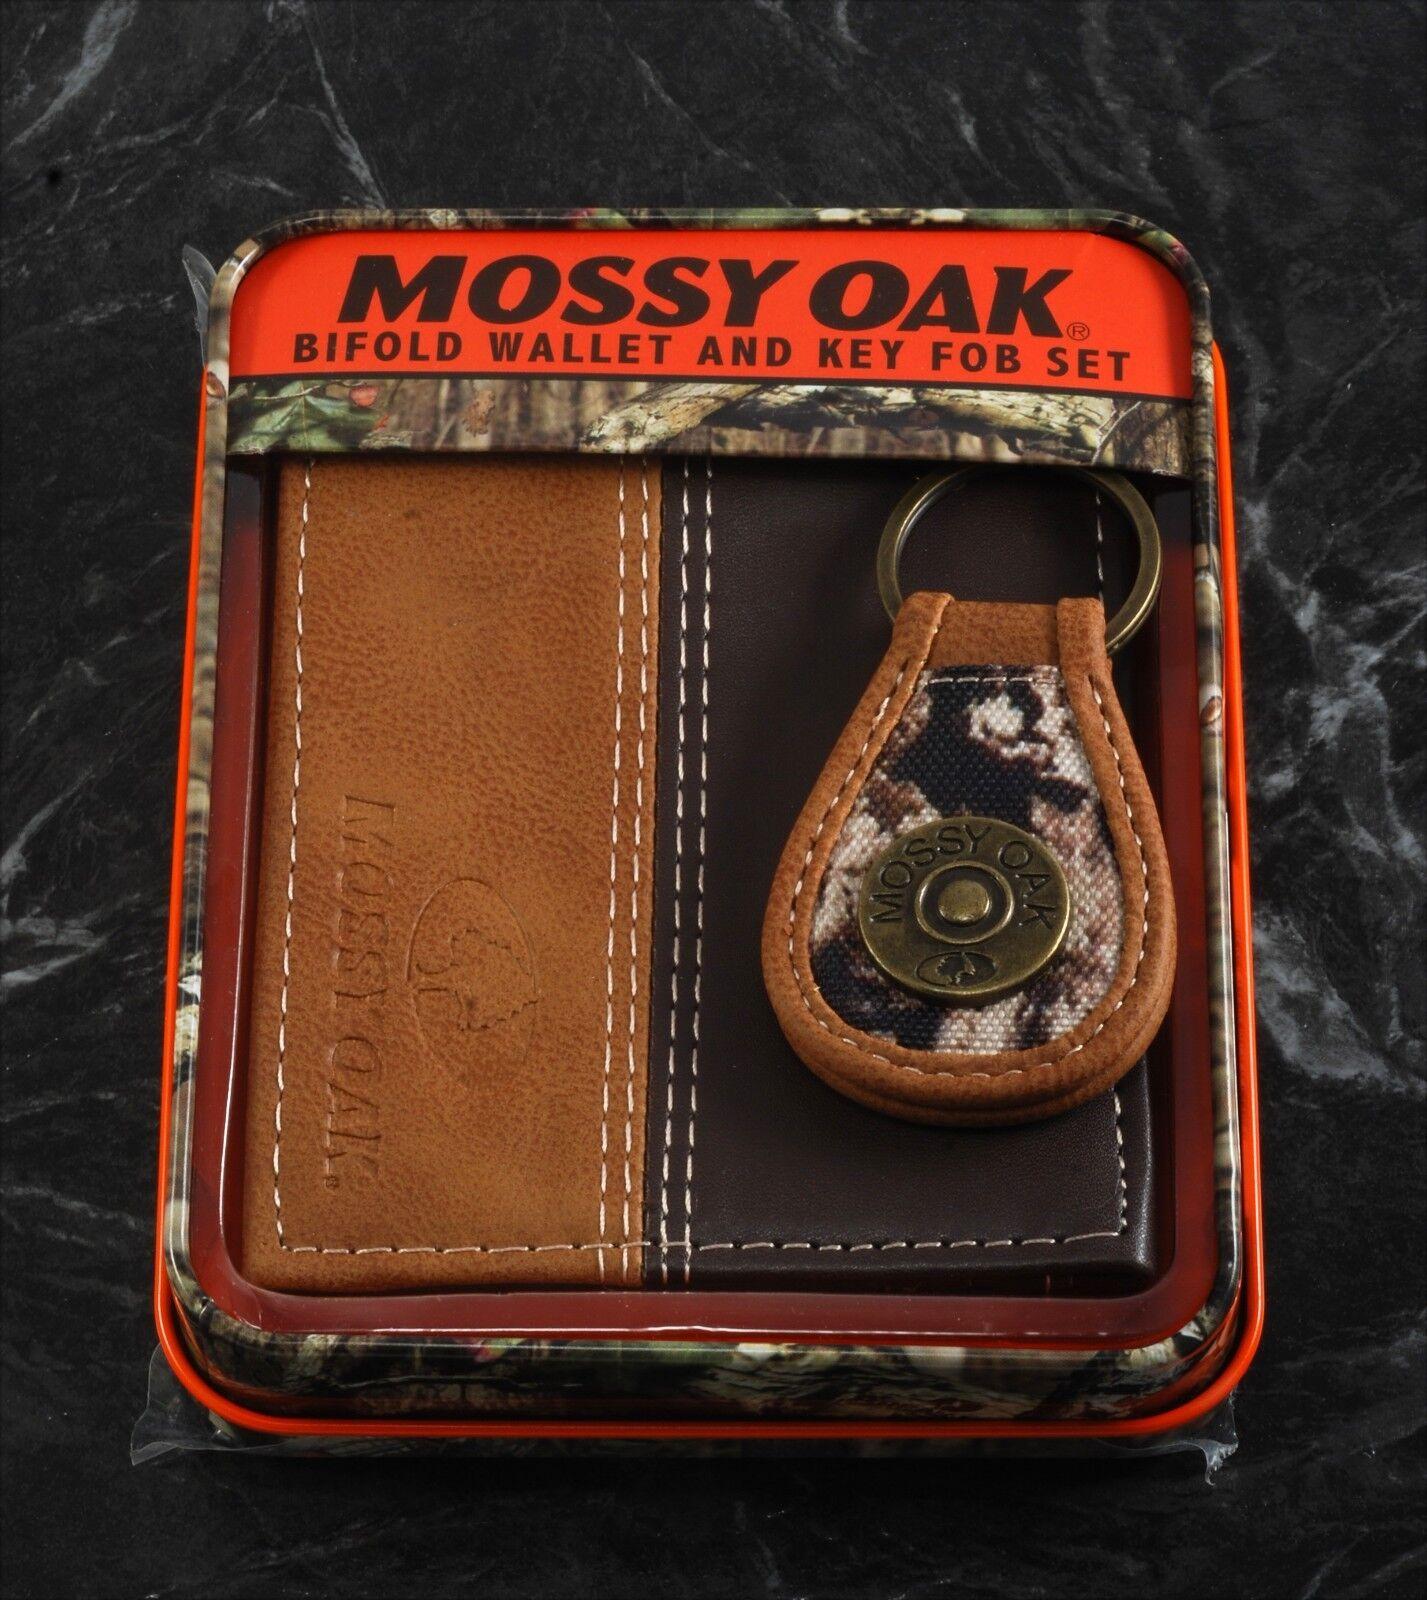 Mossy Oak Key Chain Embossed Bi-Fold Two-Tone Leather Wallet & Engraved in Tin